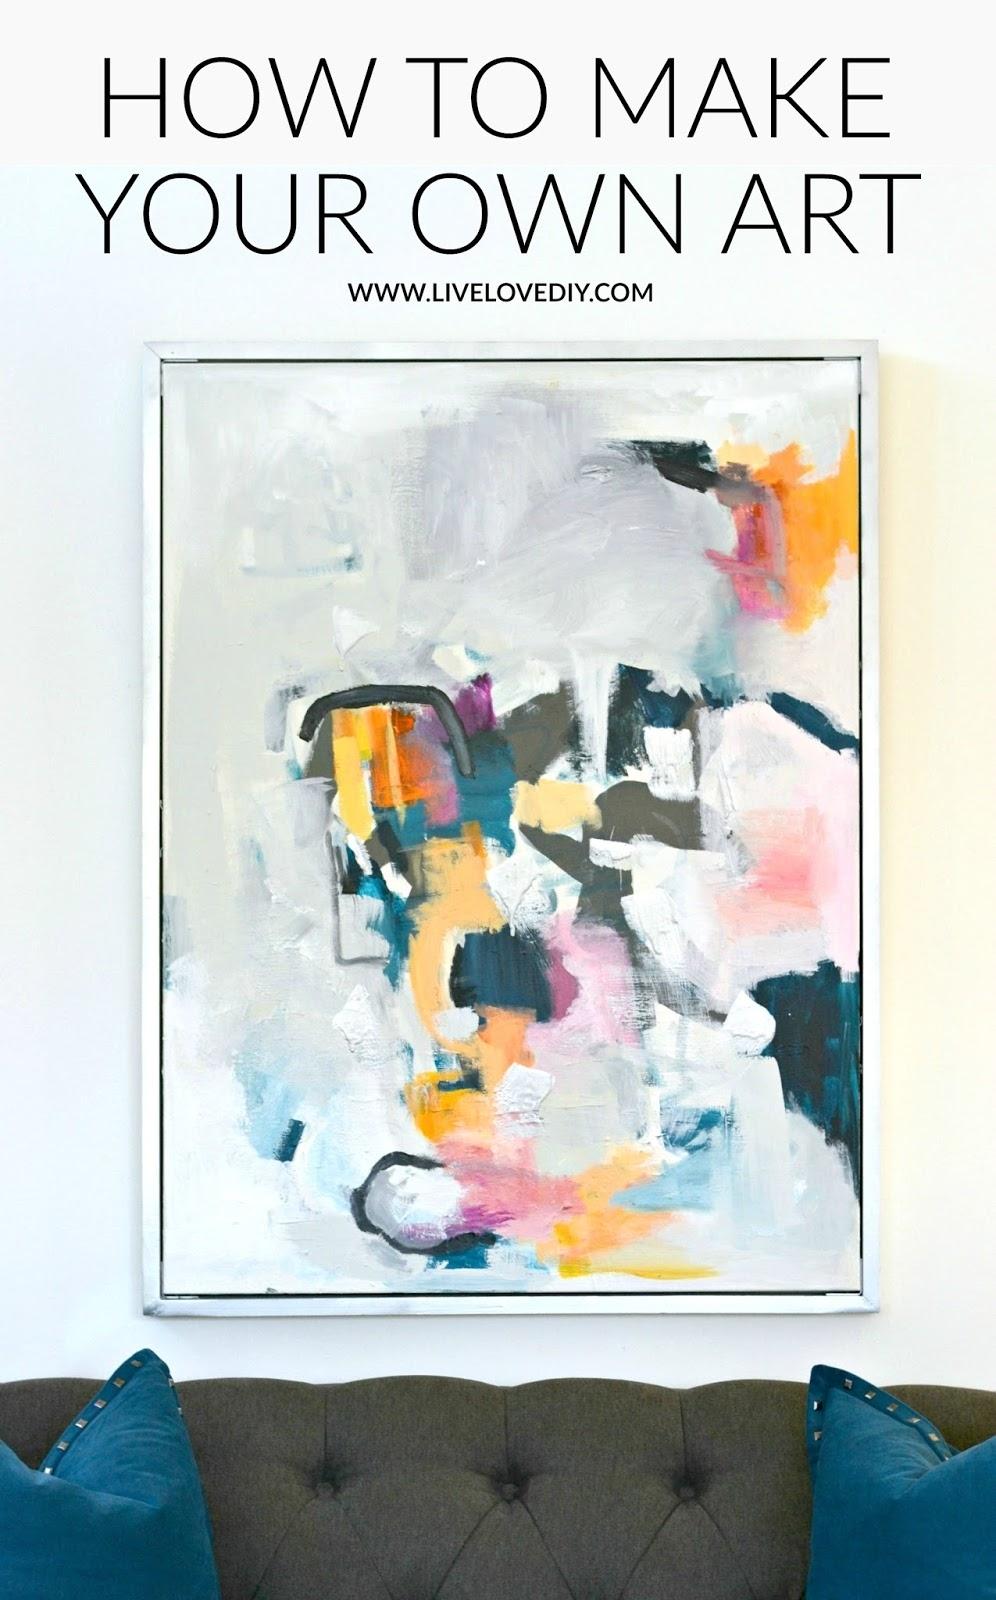 Livelovediy: Diy Abstract Wall Art In Newest Diy Abstract Wall Art (View 2 of 20)